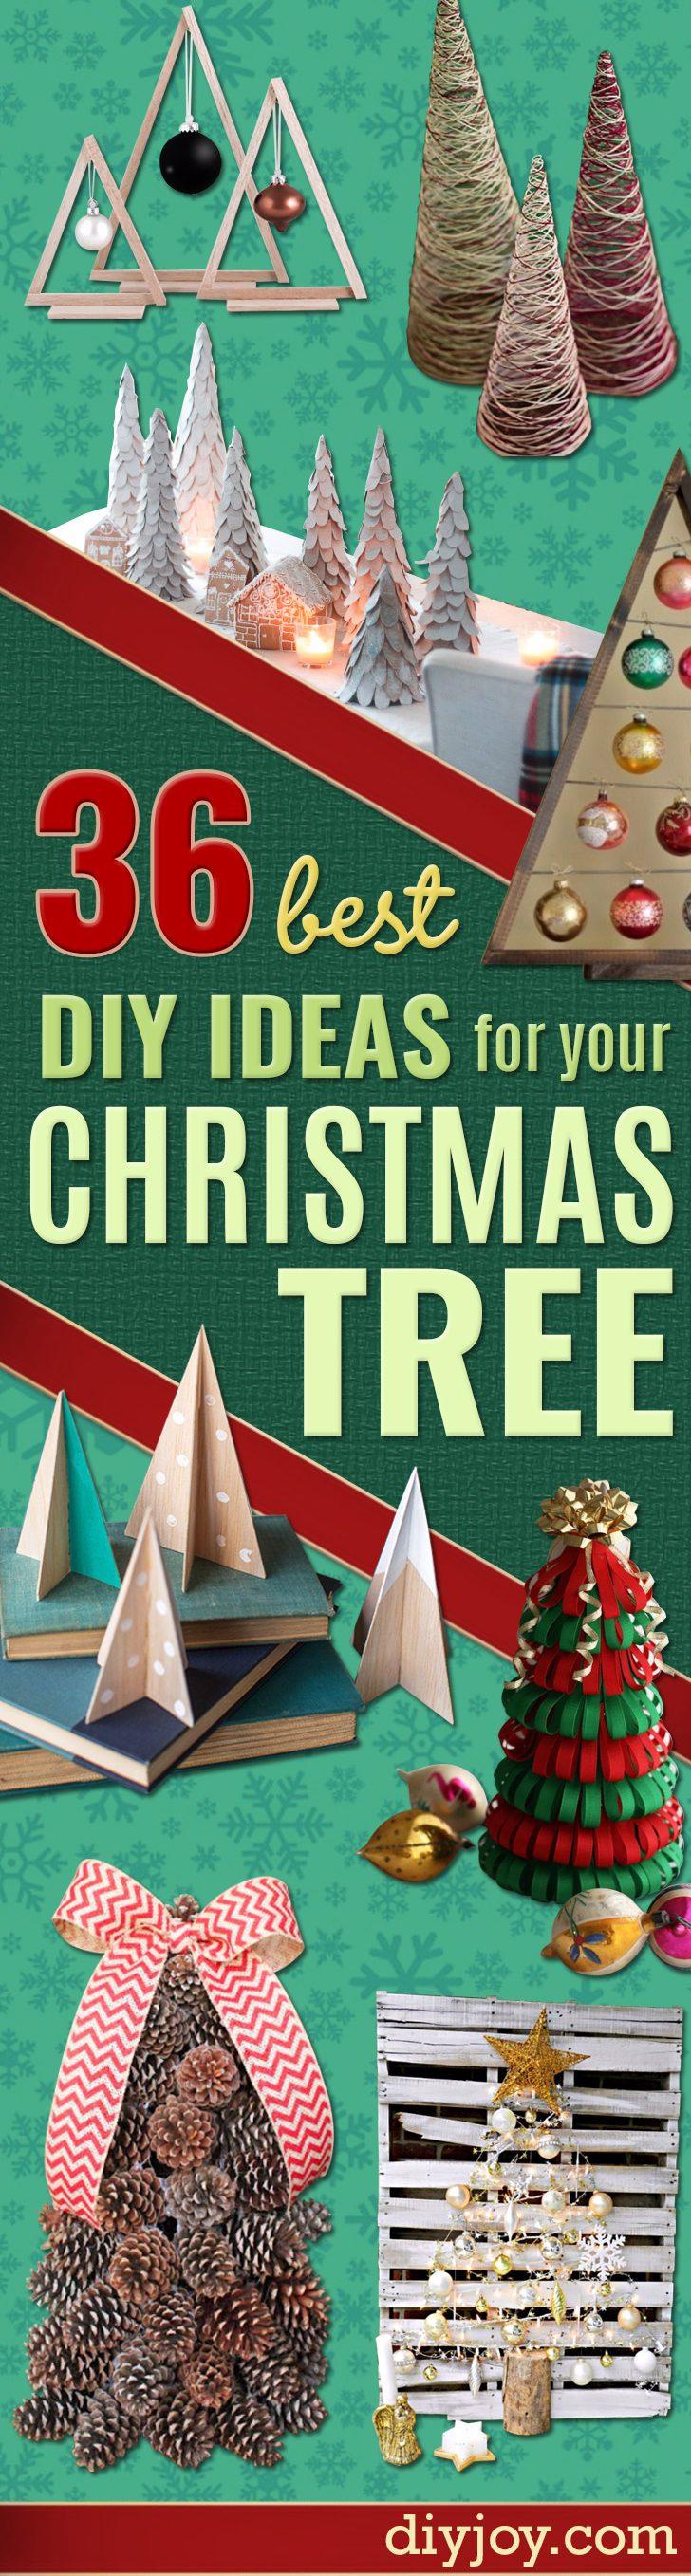 36 DIY Ideas For A Christmas Tree